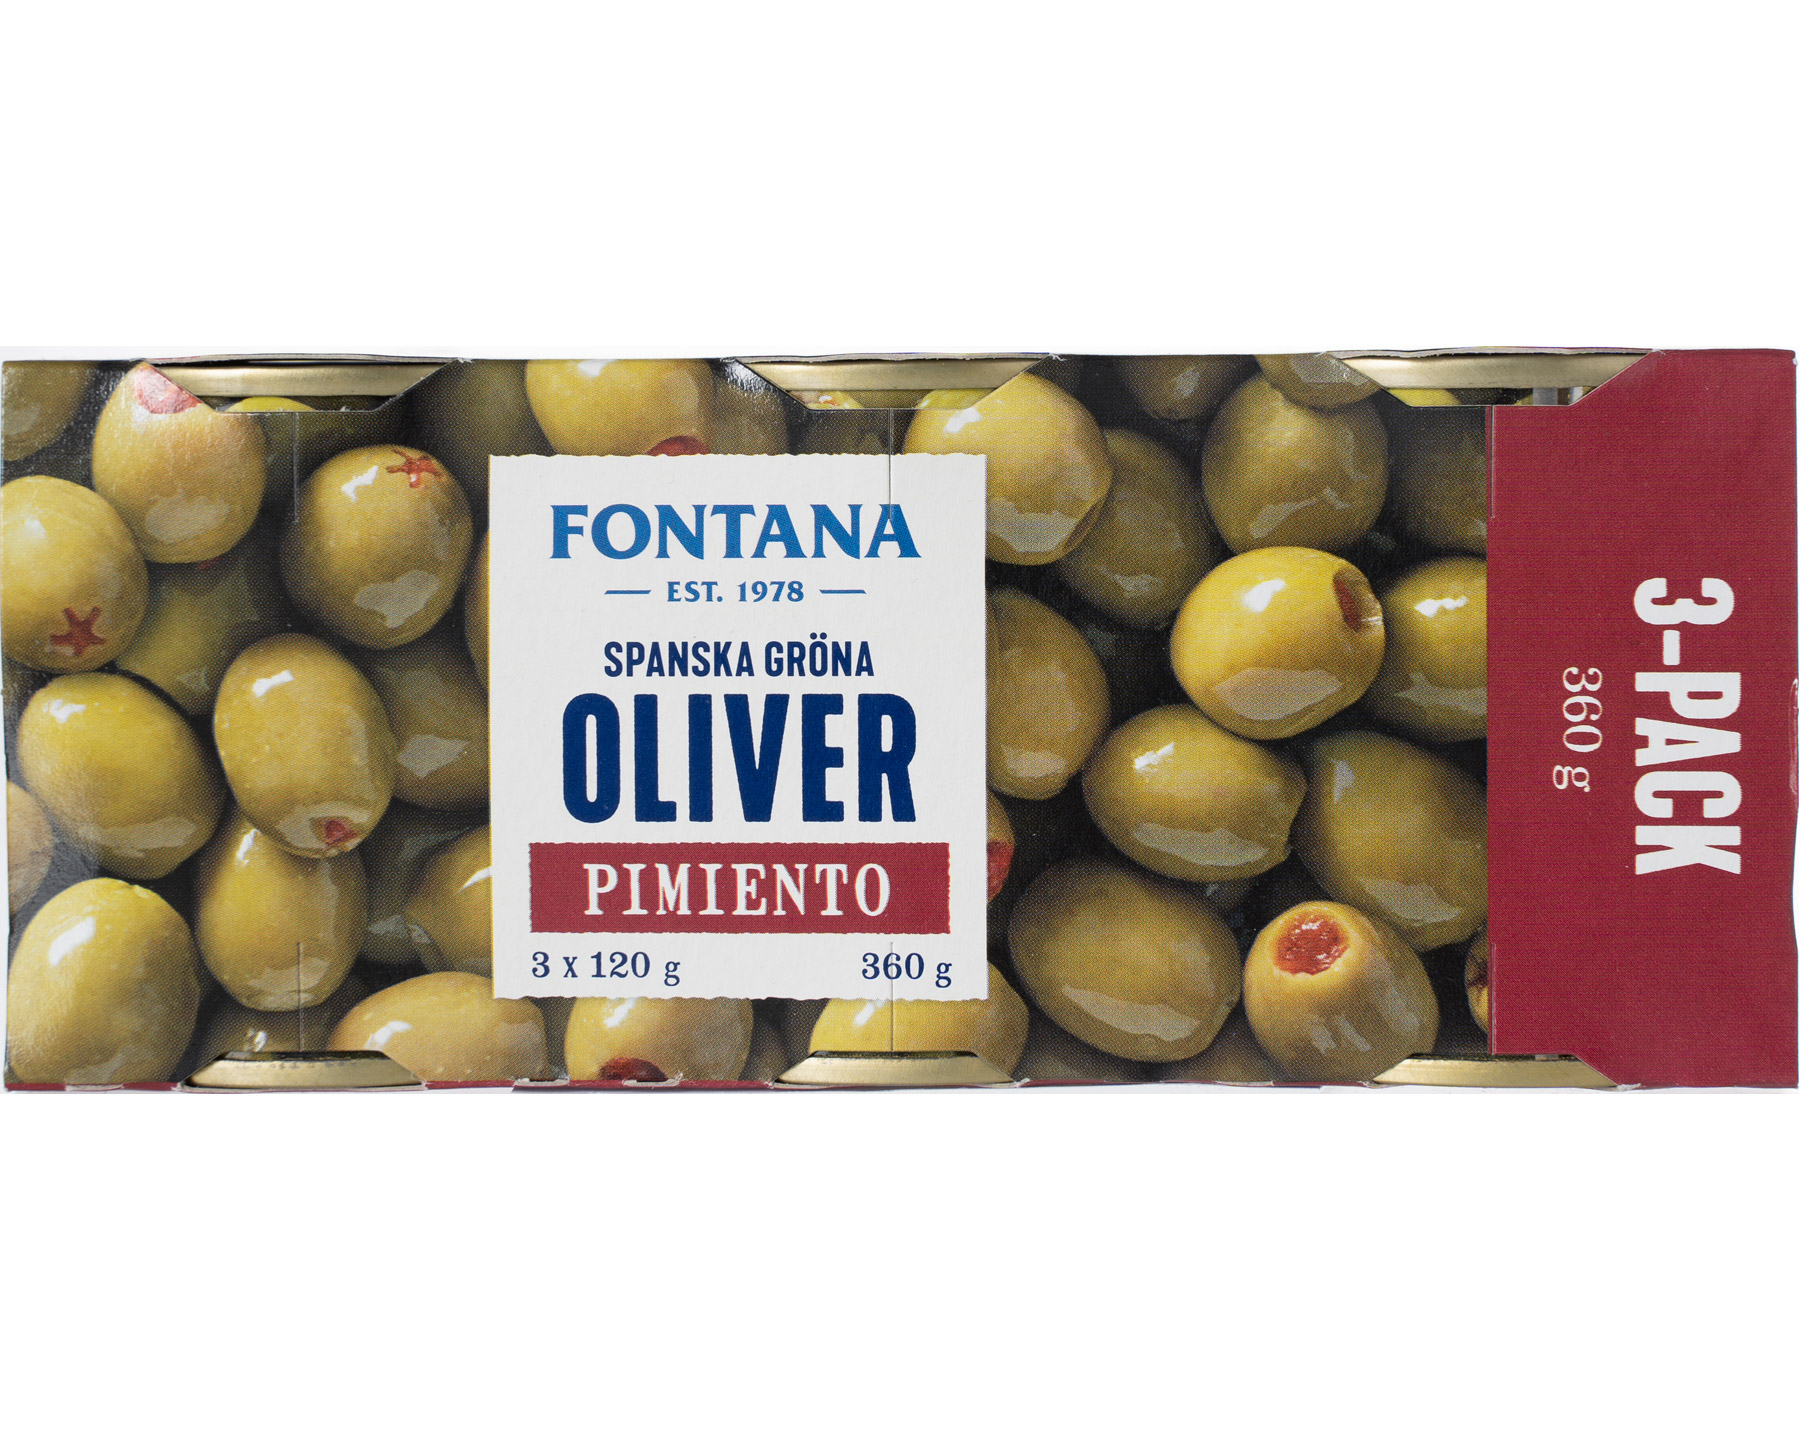 Fontana Oliver Gröna Pimiento 3 Pack 360 g